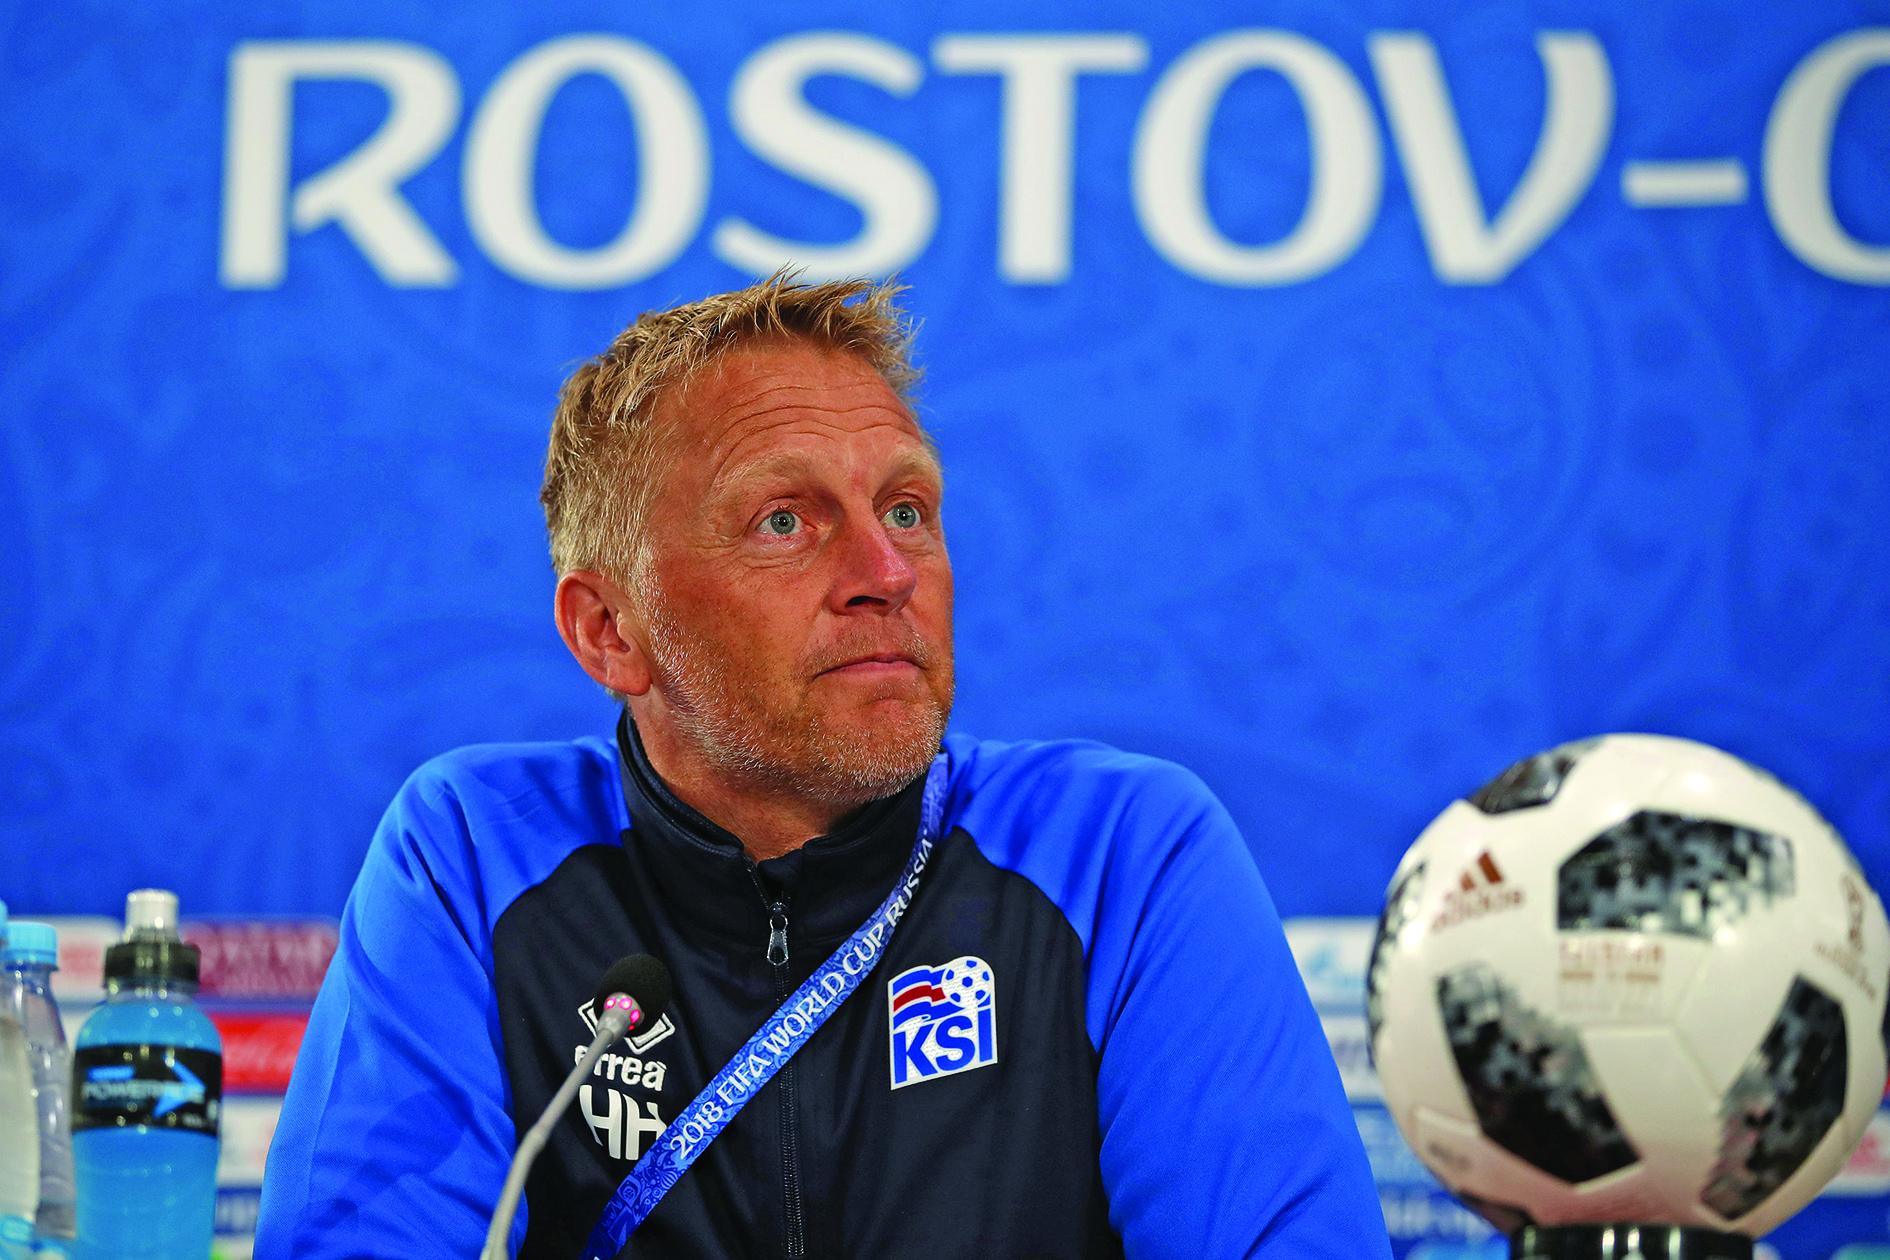 Football: Win or bust for Iceland against familiar foe Croatia